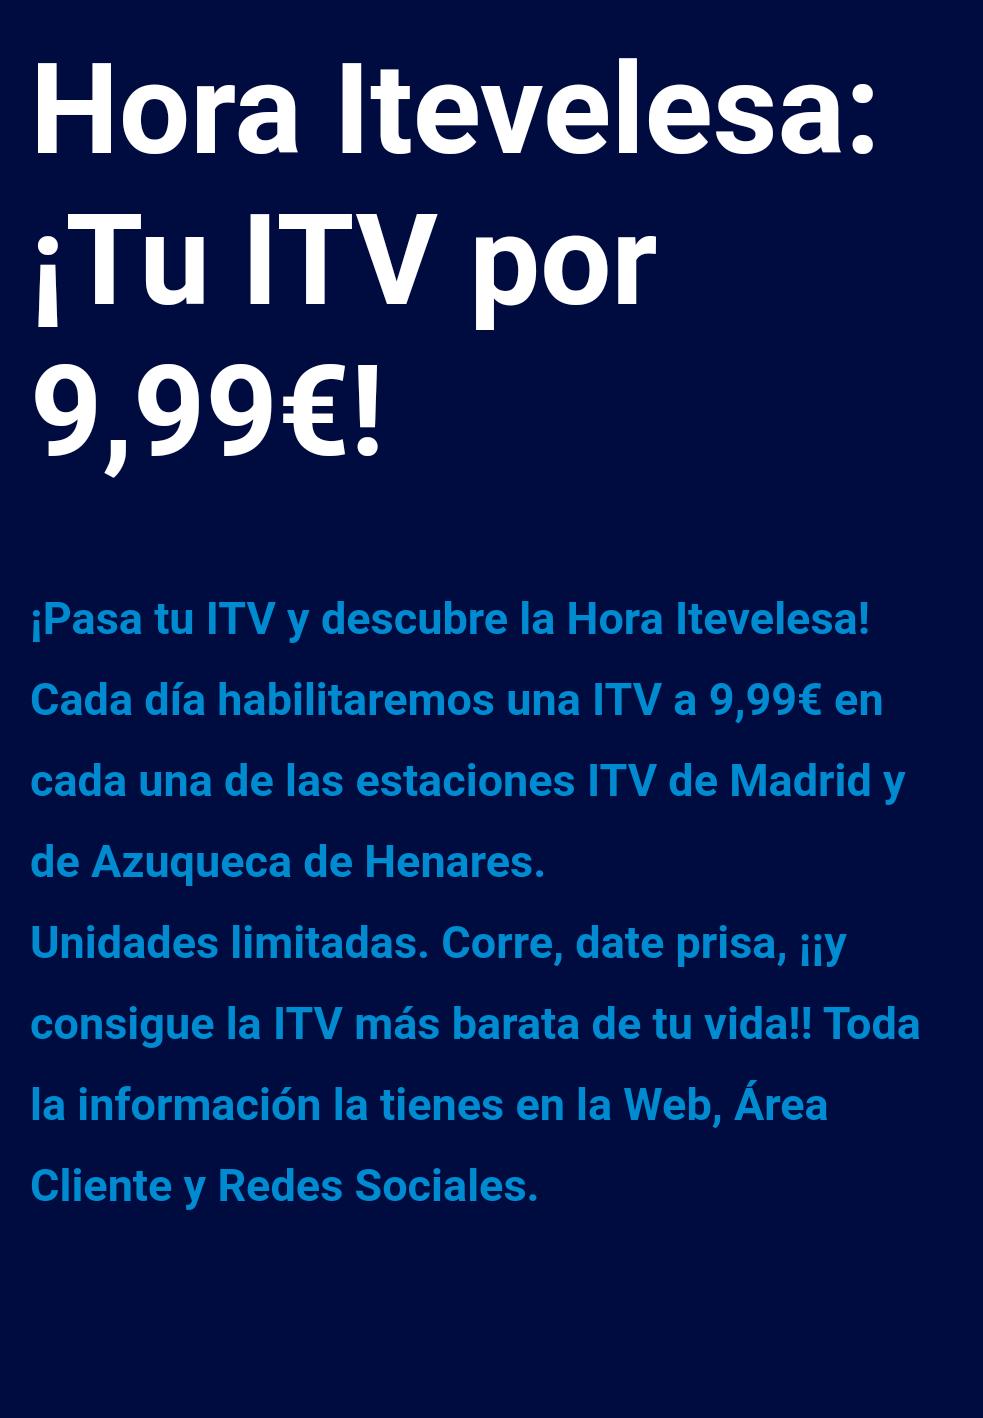 ITV desde 9,99€ red de ITV Itevelesa